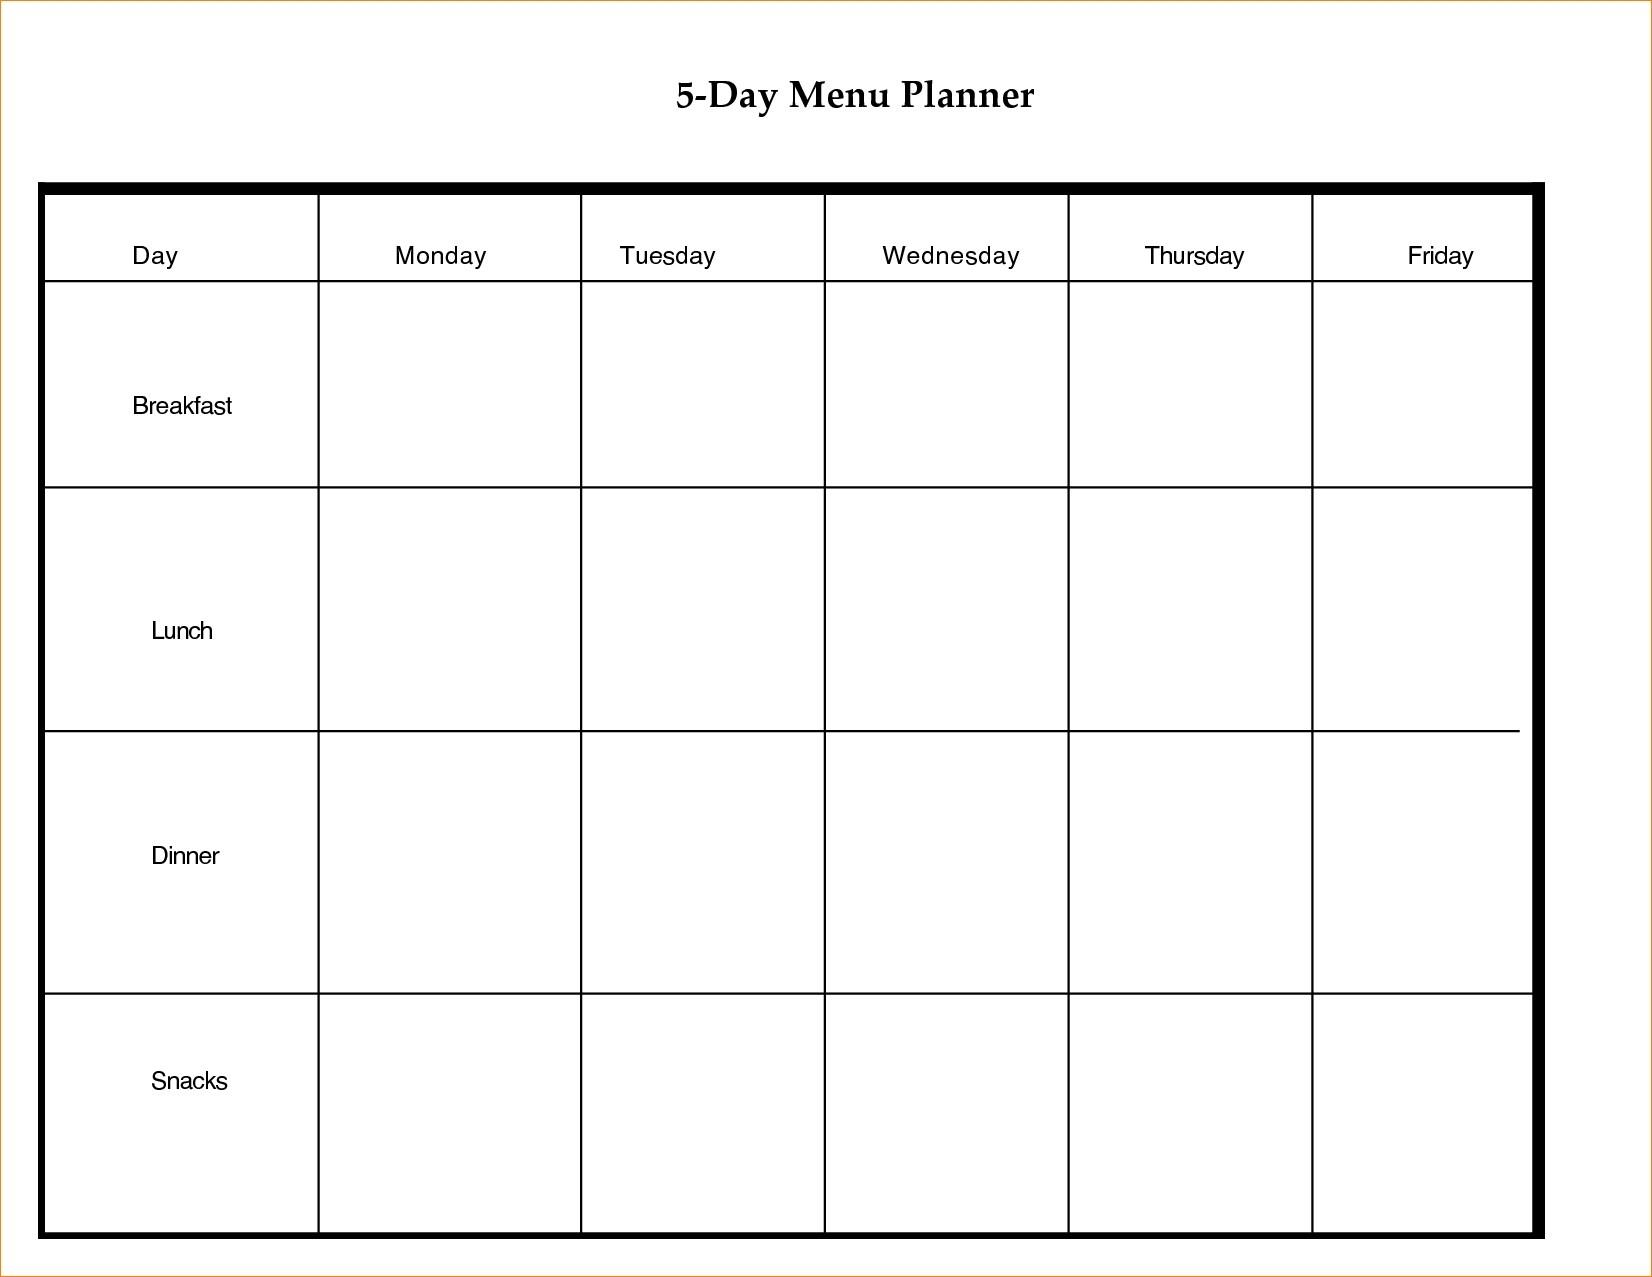 Blank Calendar 5 Weeks | Igotlockedout